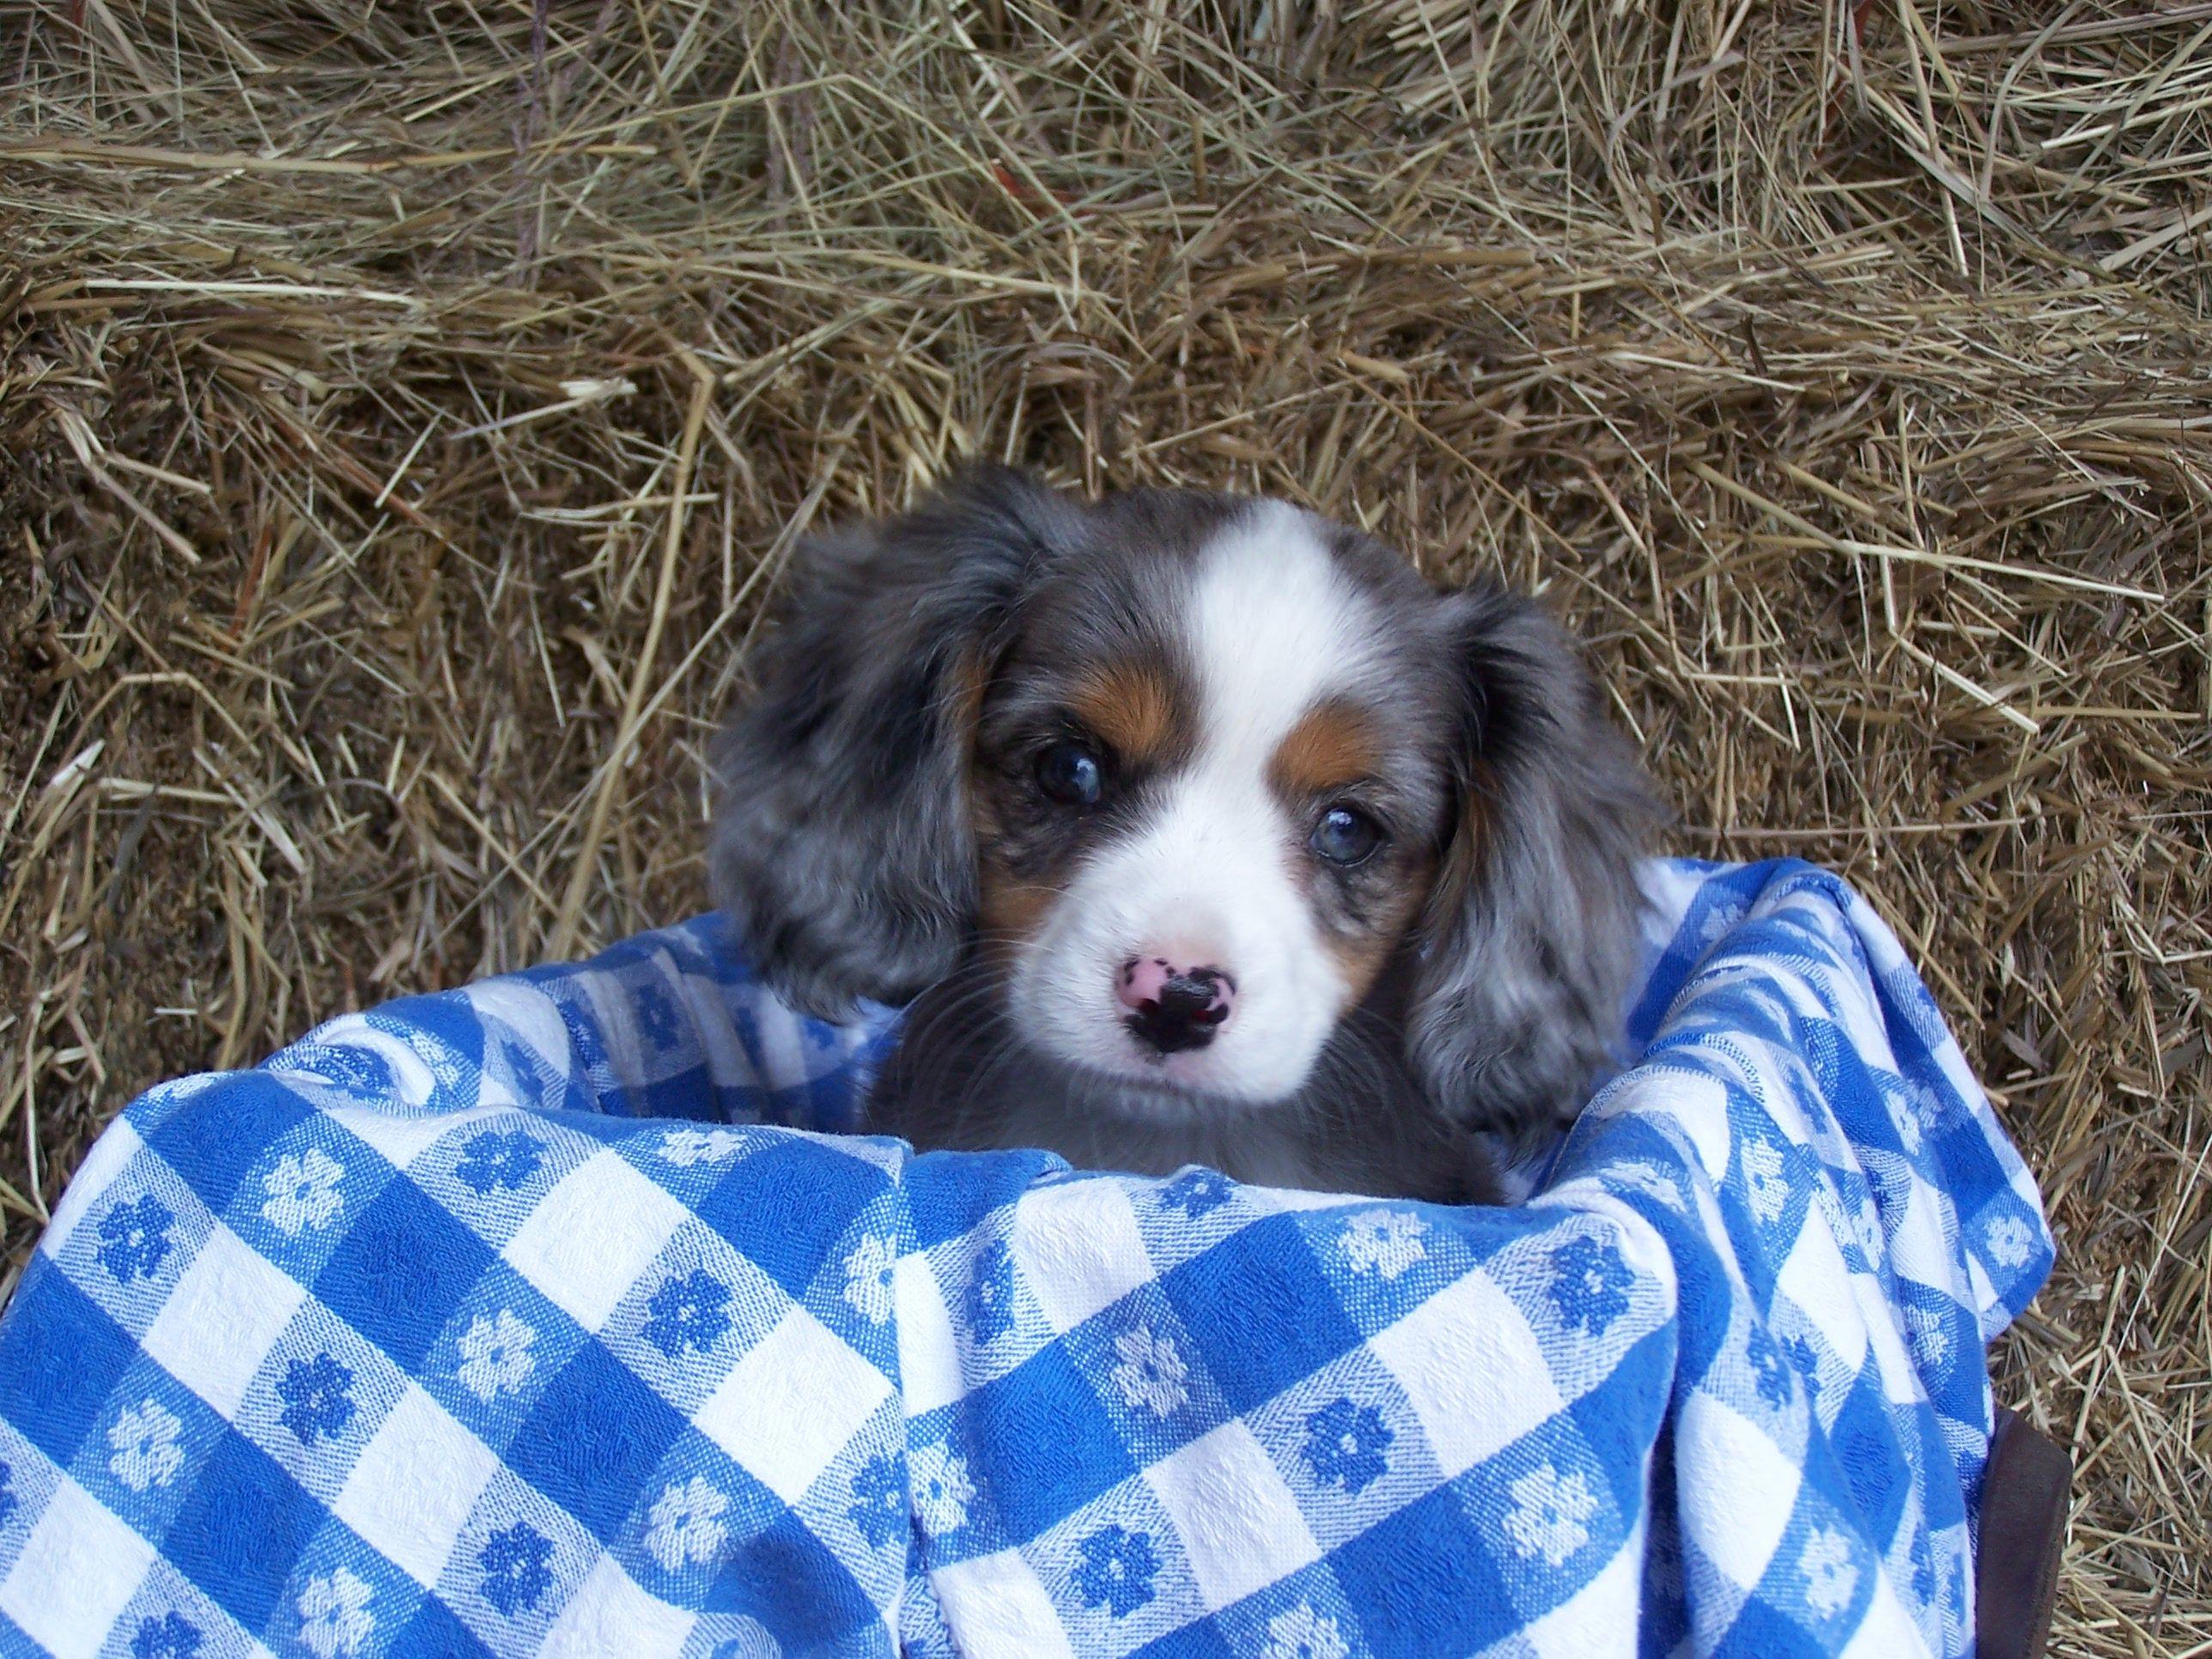 Concho A 8 1 2 Week Old Blue Merle Female Aussalier King Charles Cavalier Spaniel Puppy Cavalier King Charles Spaniel Tricolor Cavalier King Charles Spaniel